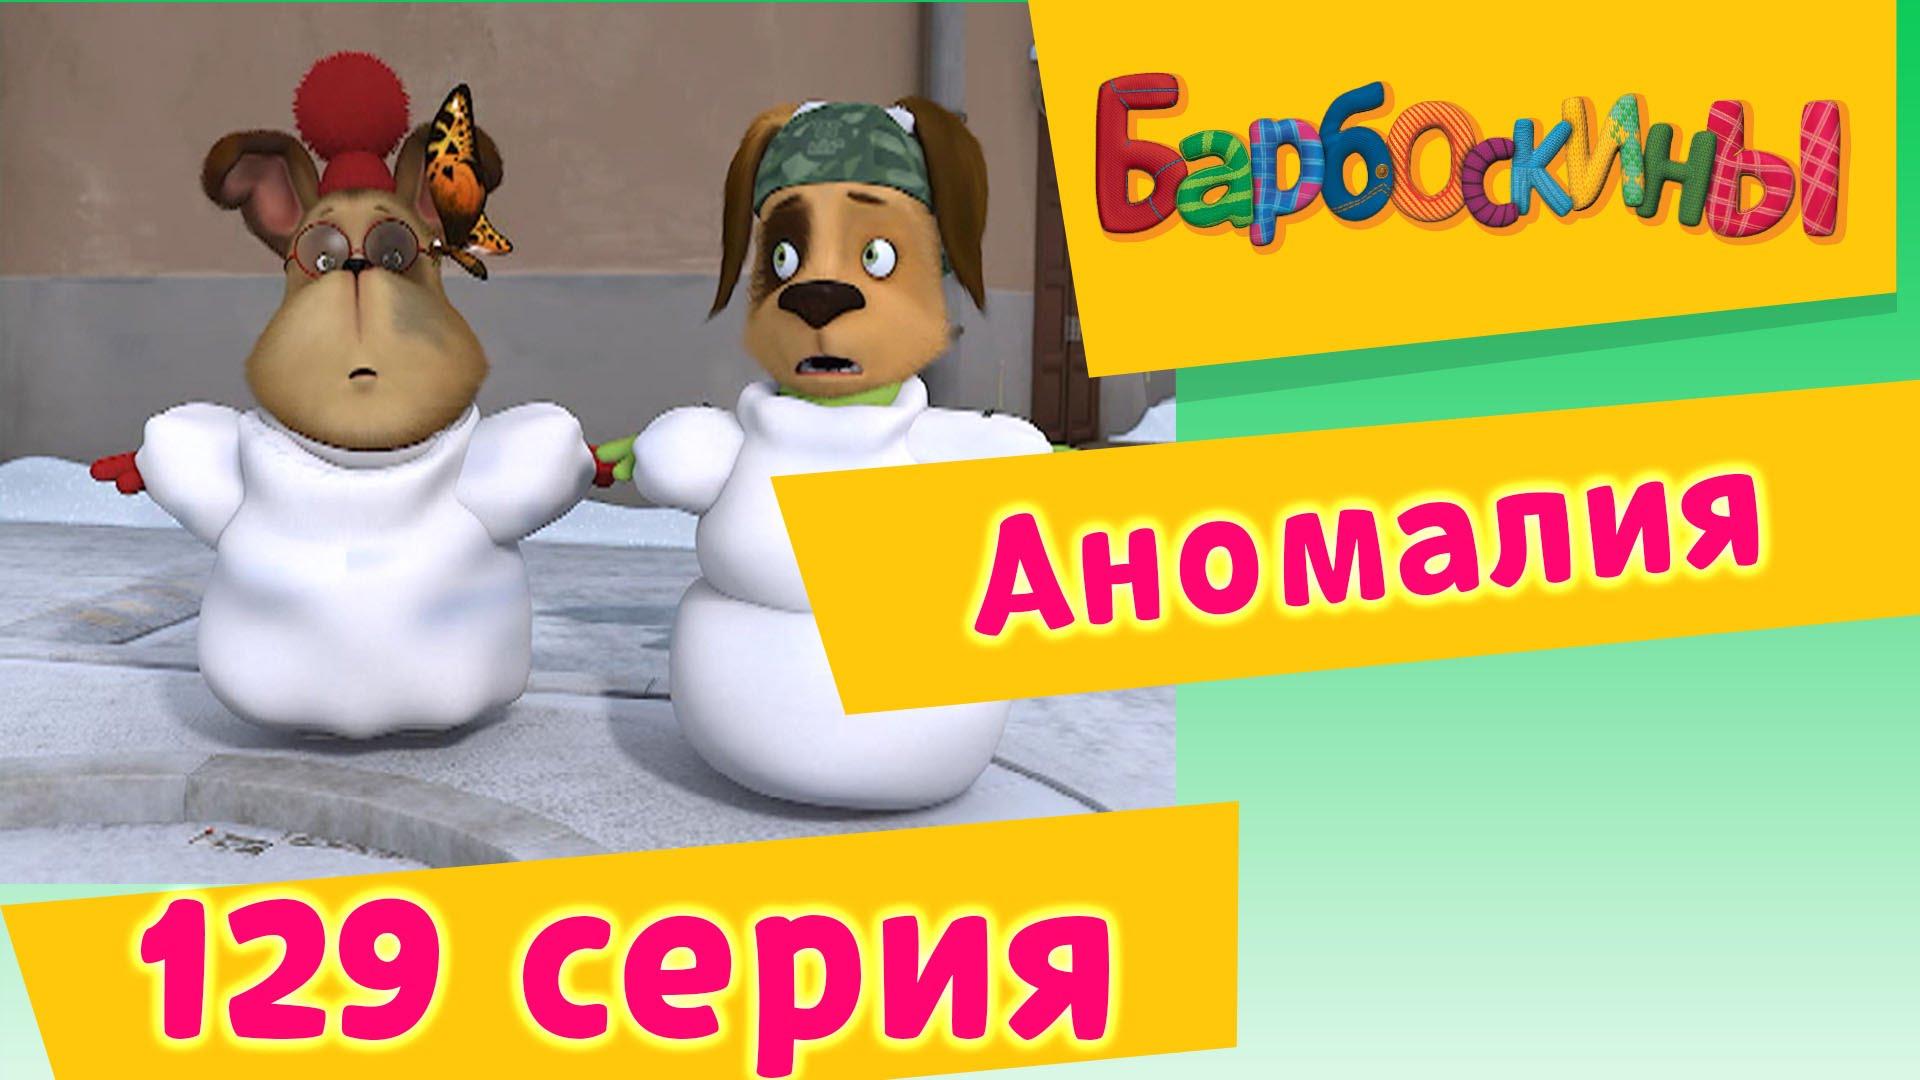 Барбоскины — 129 серия. Аномалия